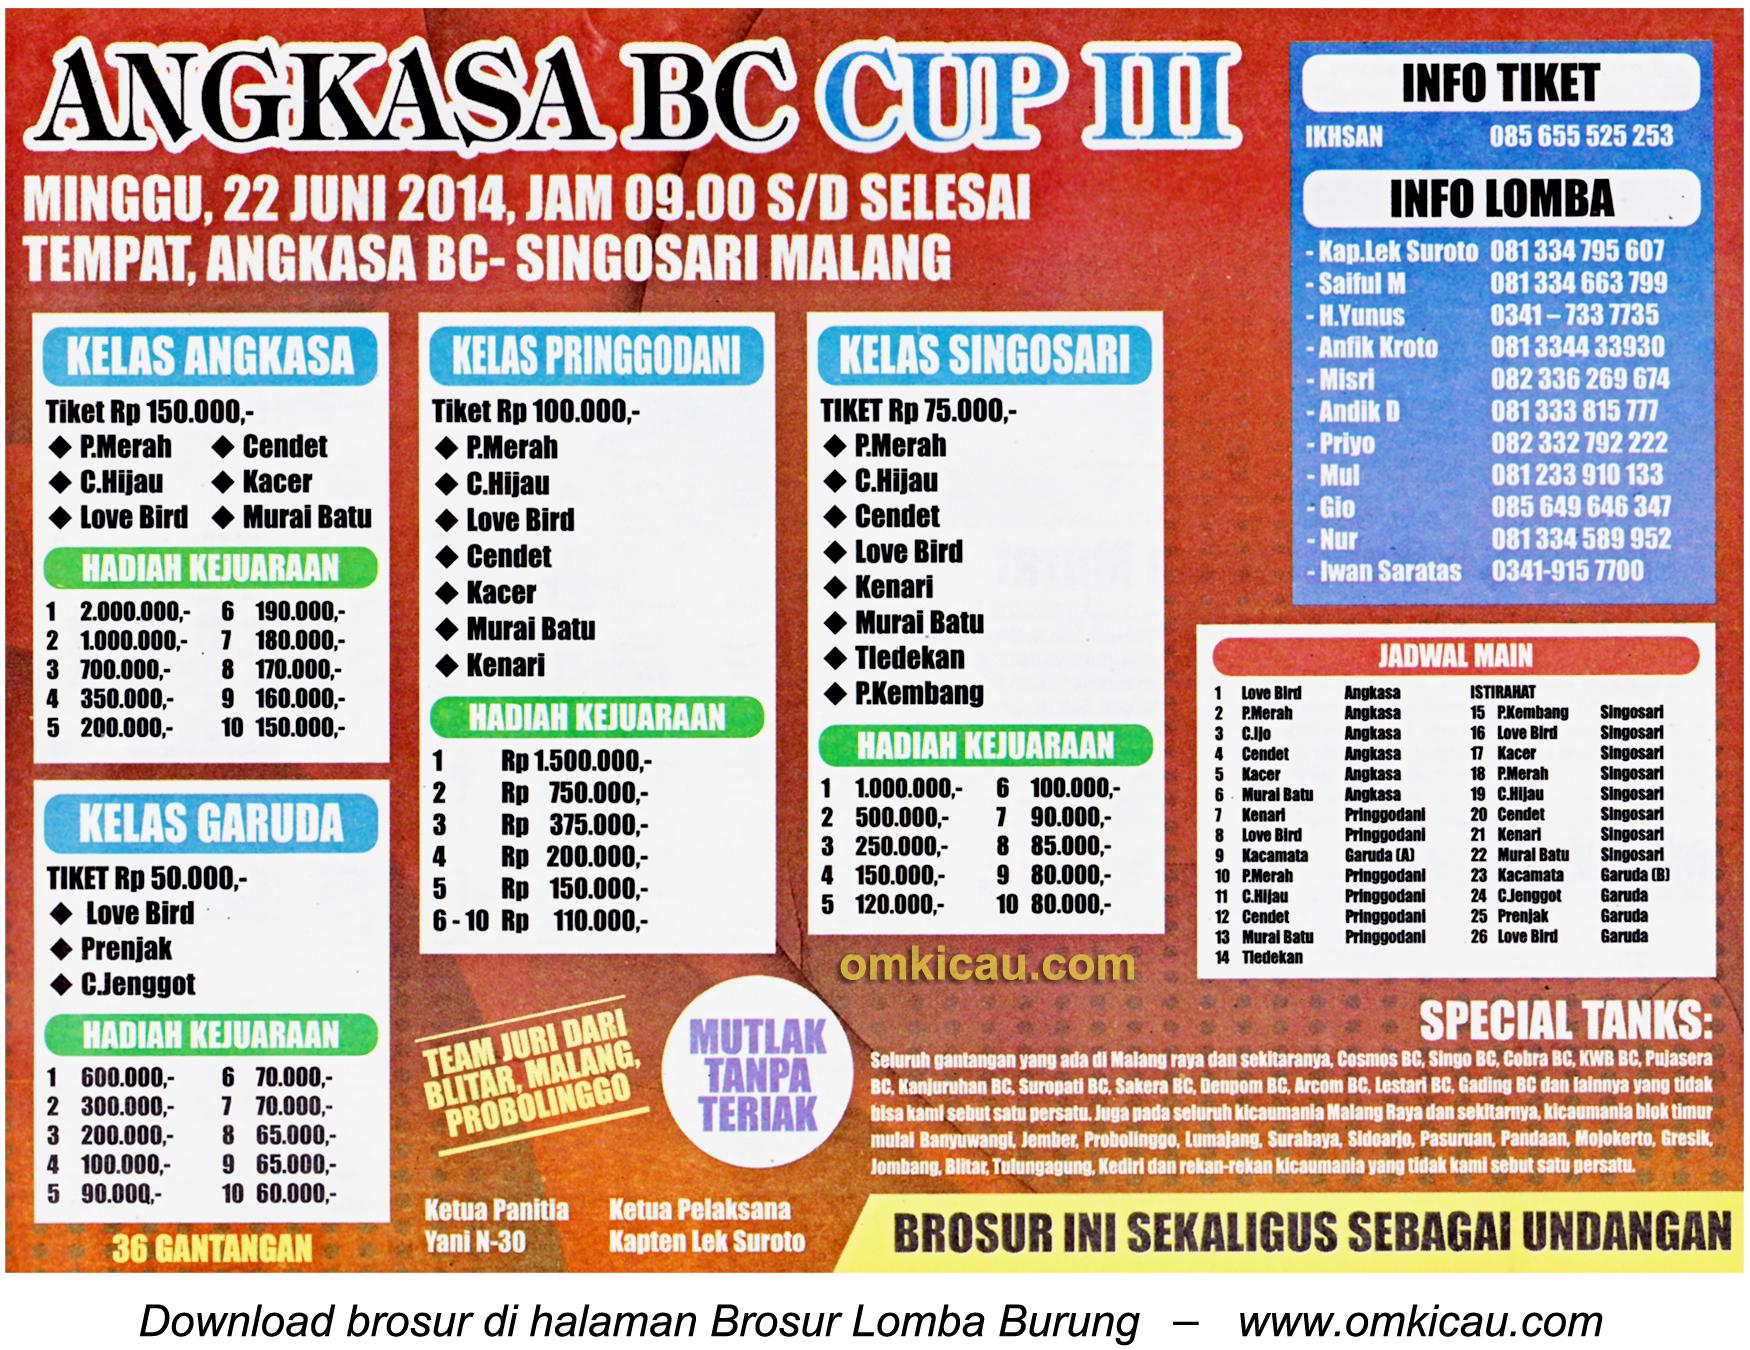 Brosur Lomba Burung Berkicau Angkasa BC Cup III, Malang, 22 Juni 2014